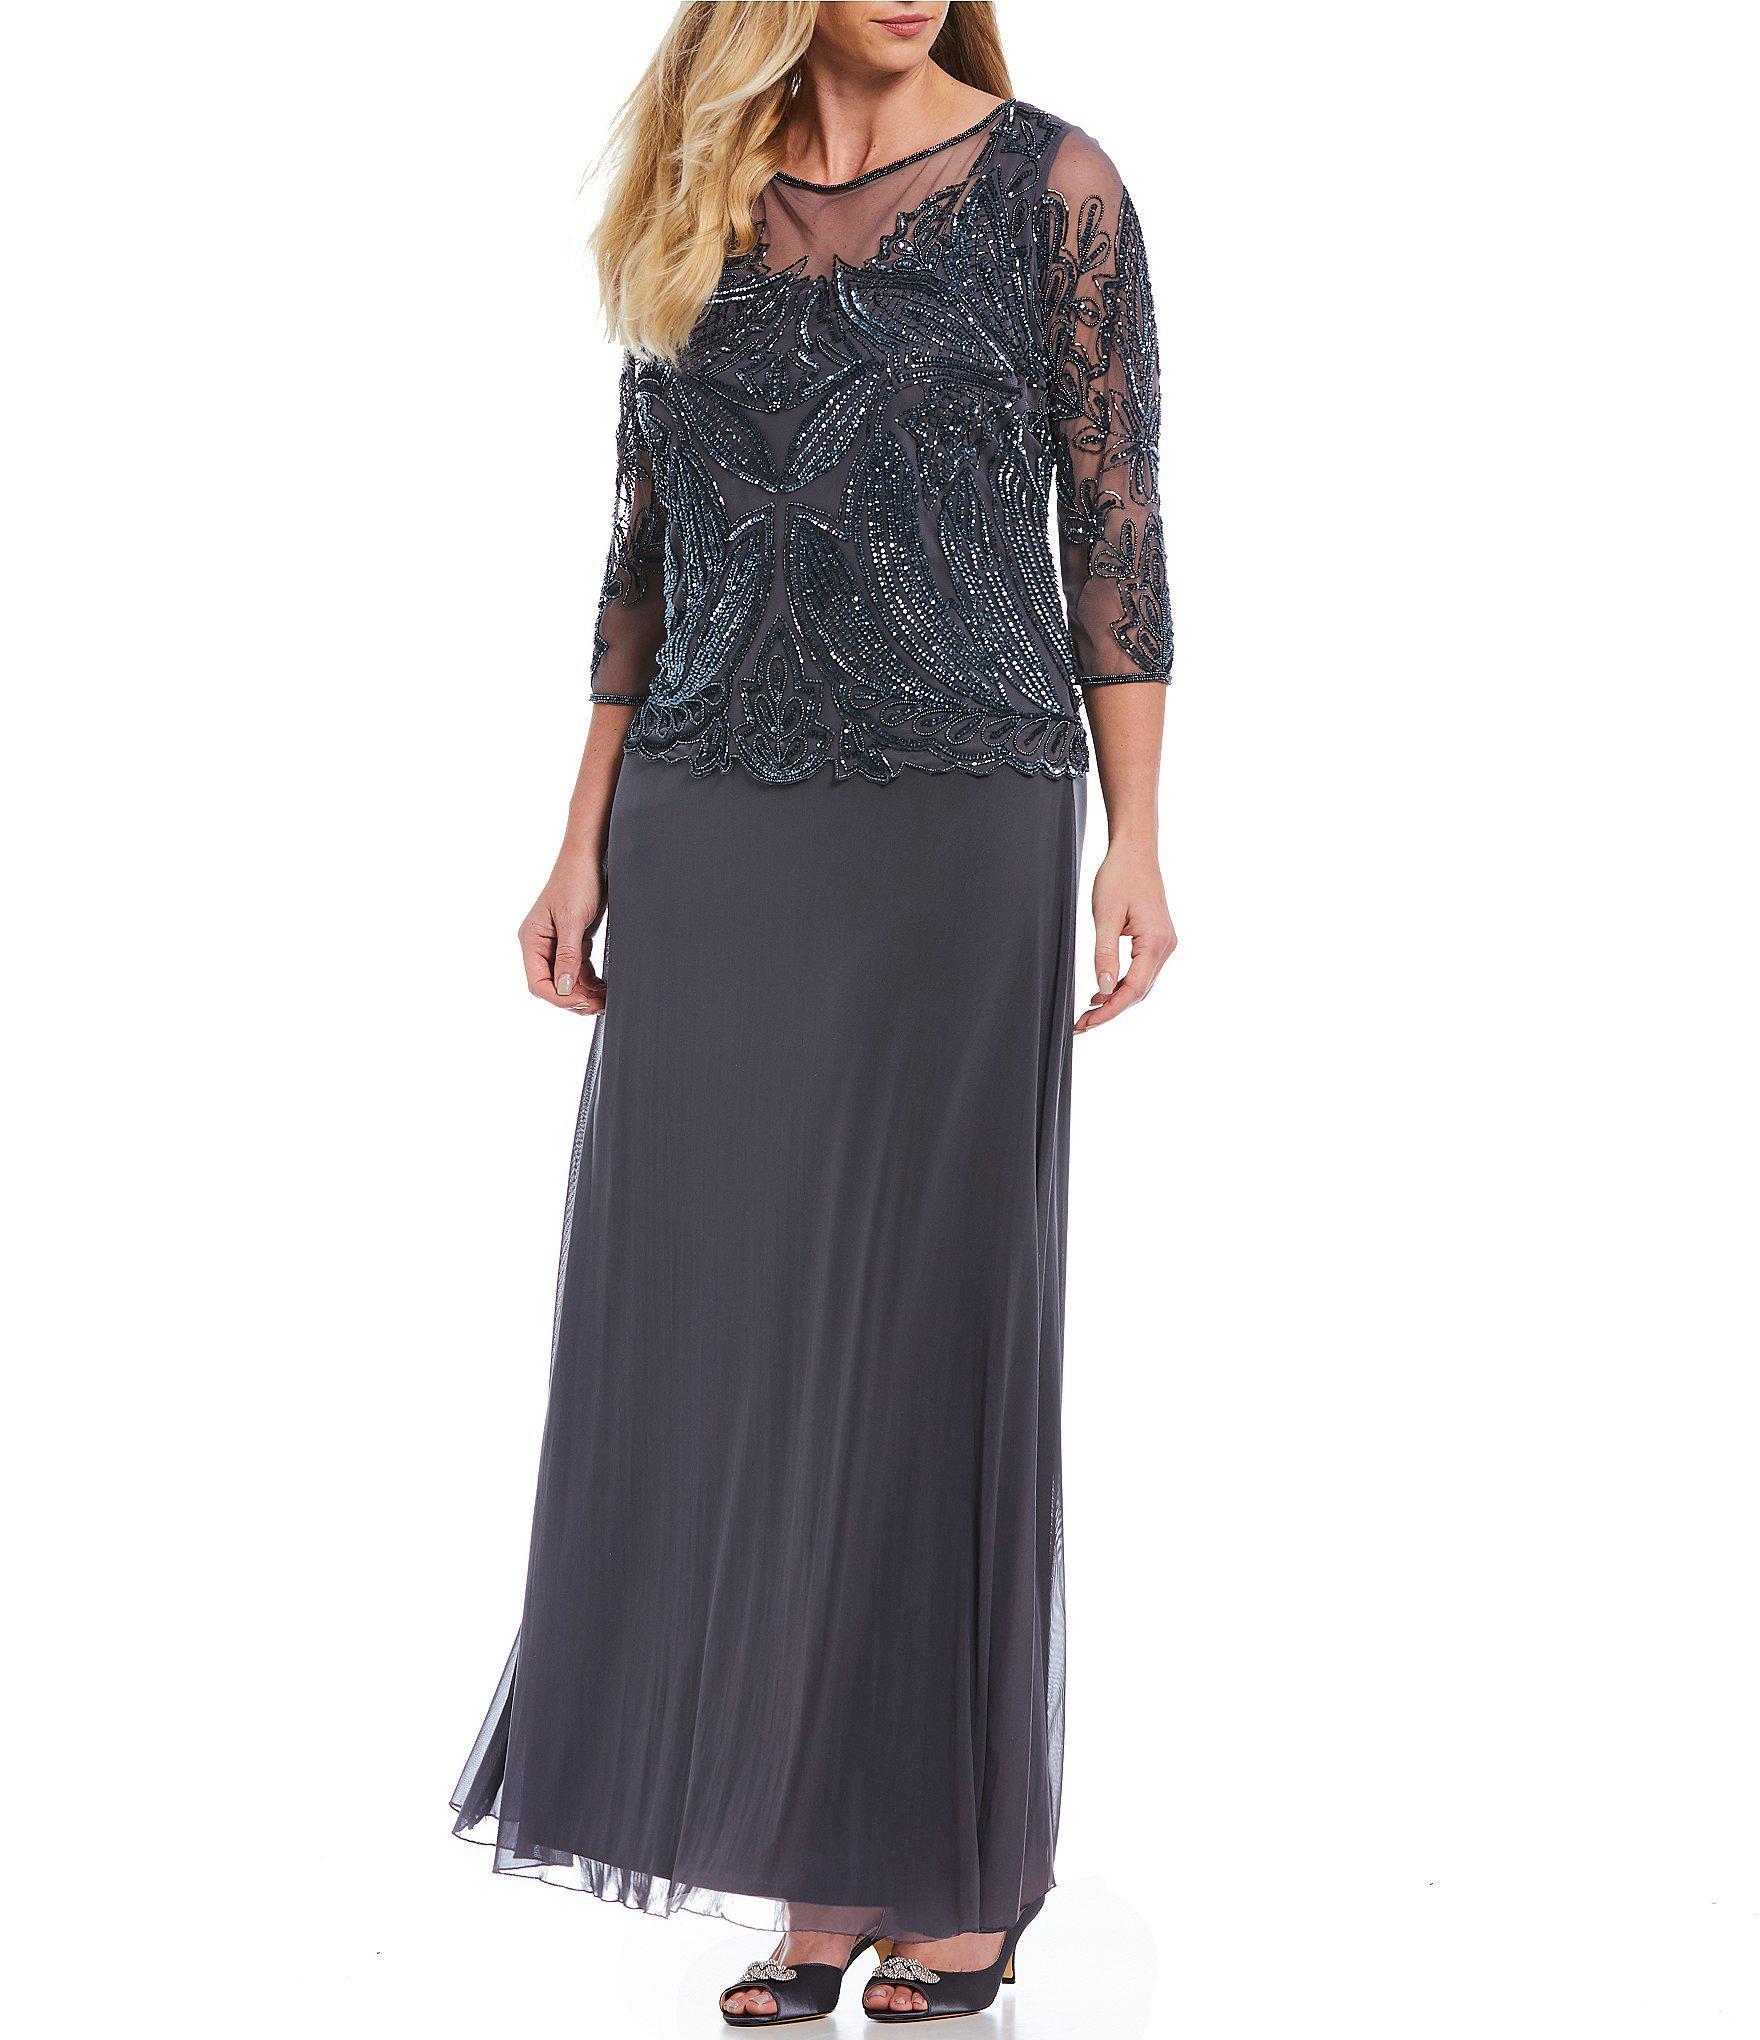 ea9056cb99dbd Lyst - Pisarro Nights Plus Floral Beaded Bodice Mock 2-piece Dress ...